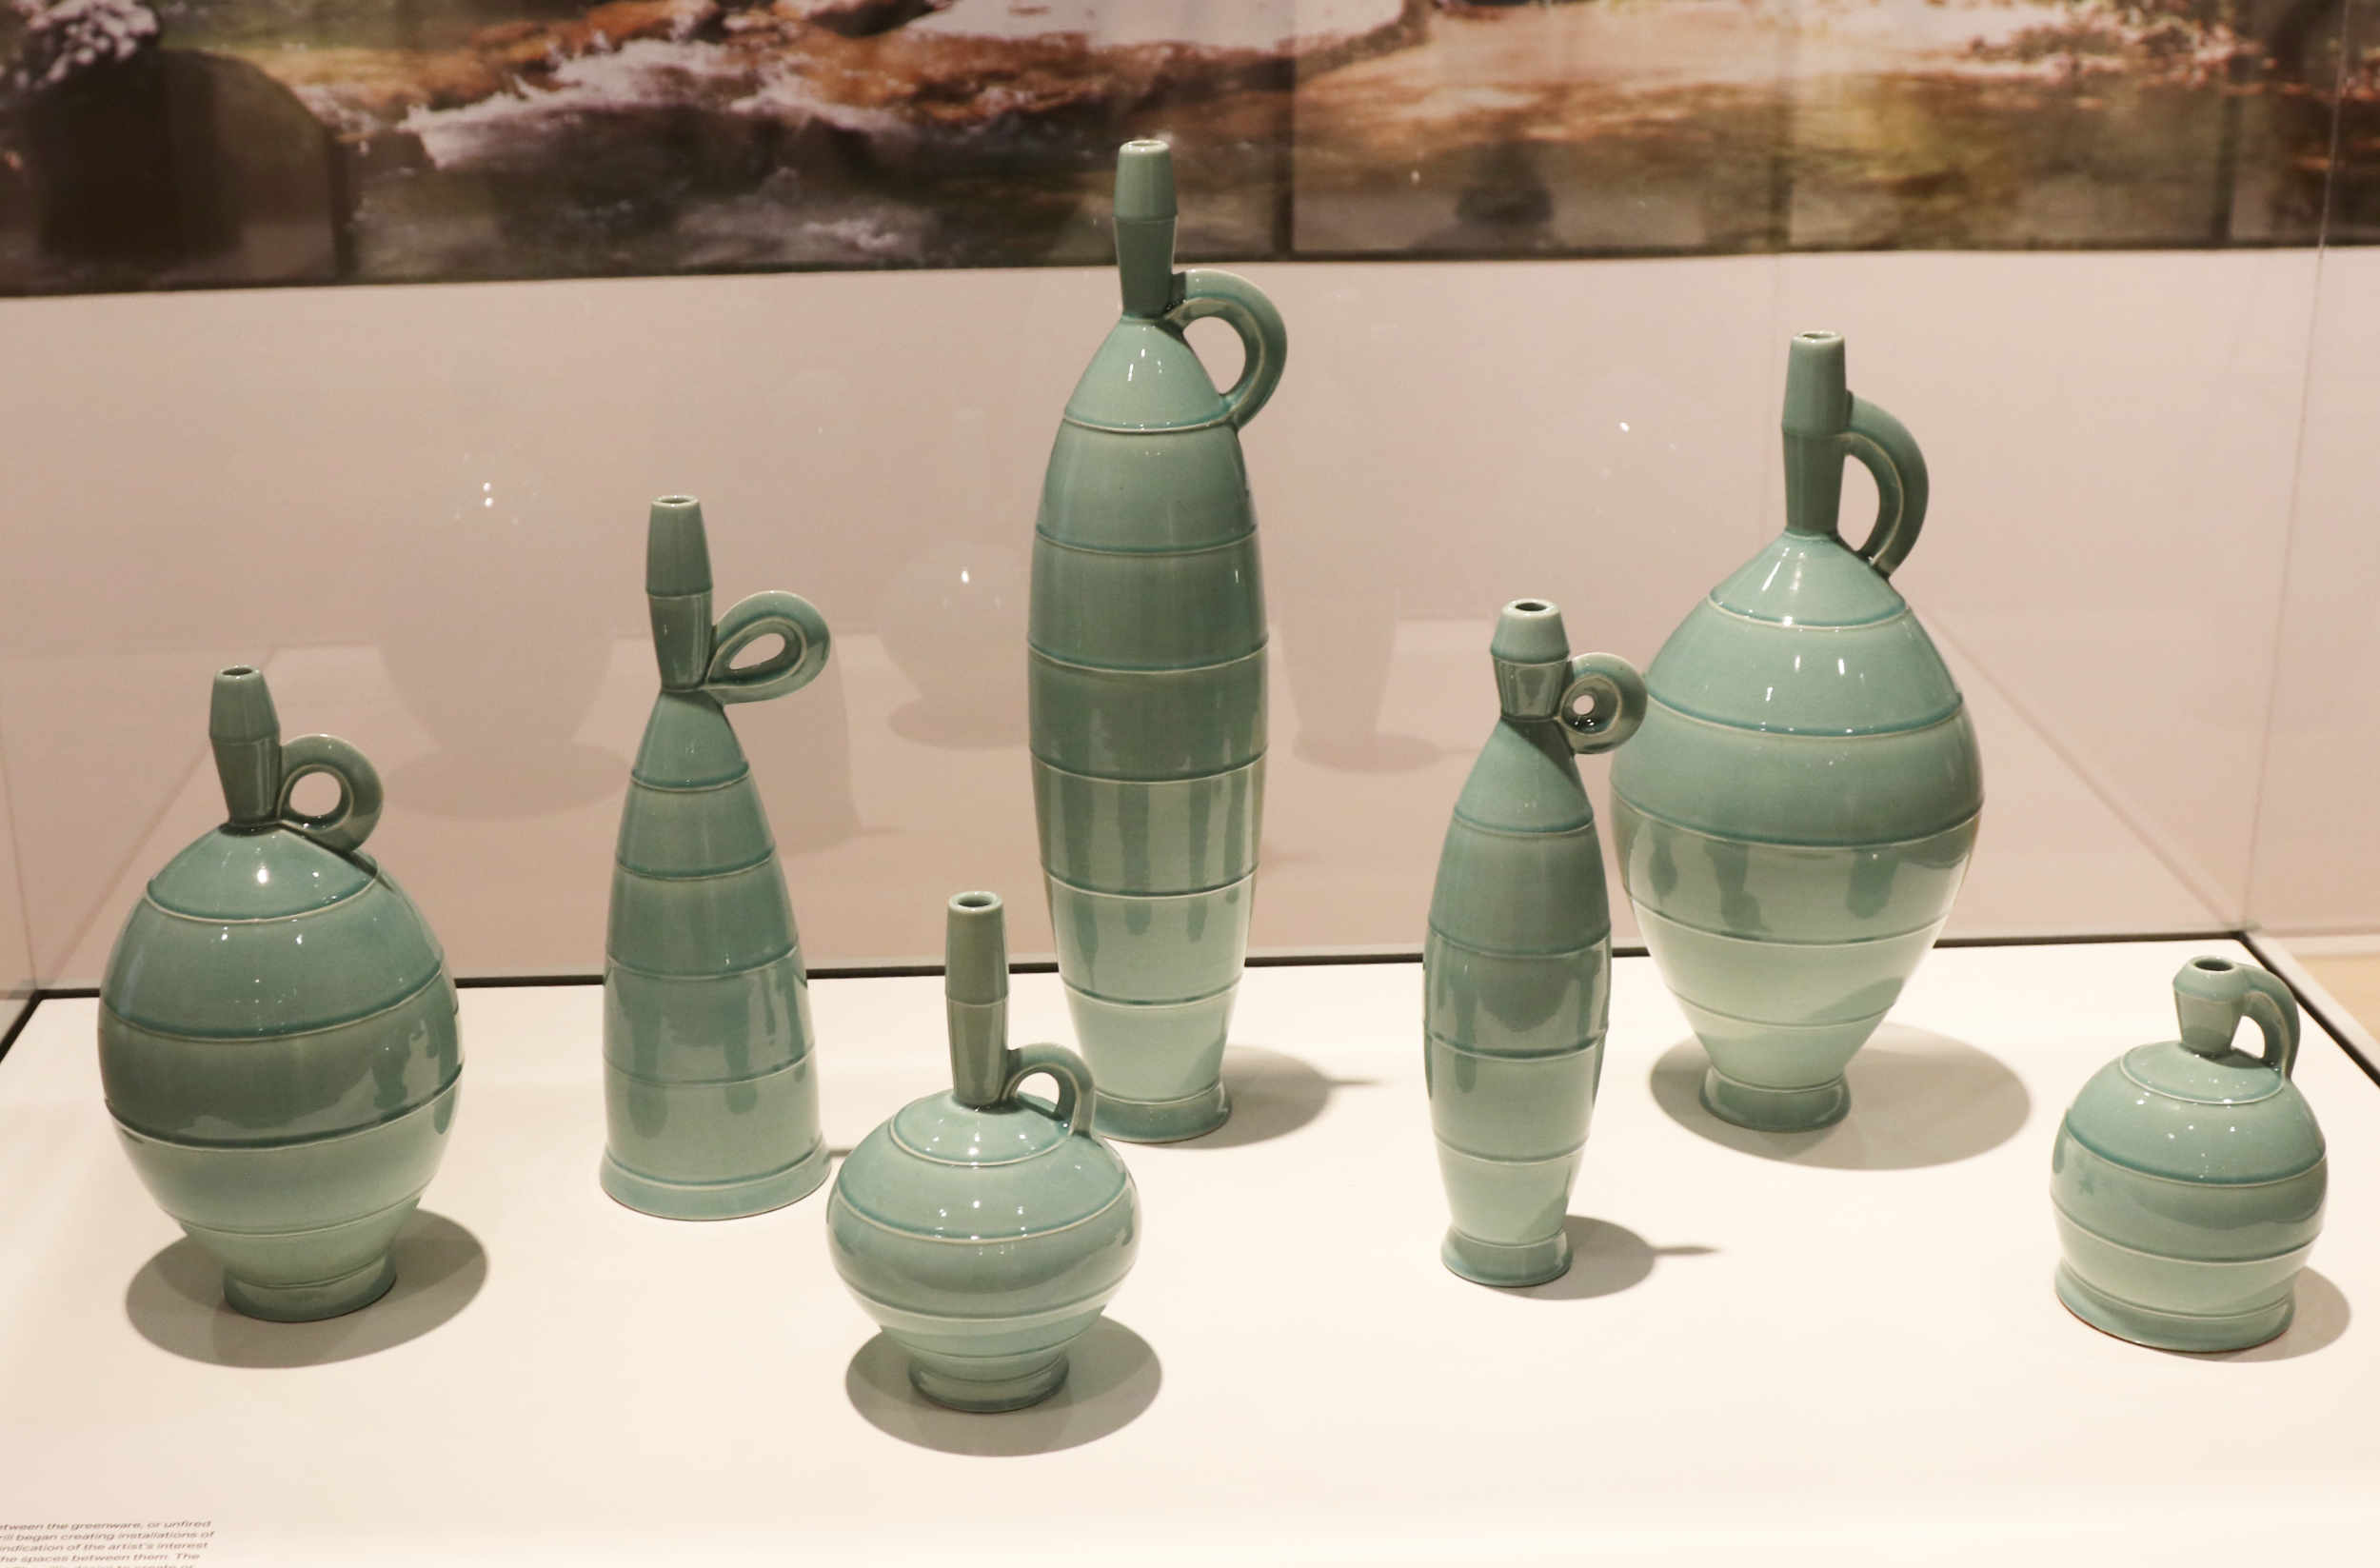 Michael Sherrill, Aqua Bottles (Front View), 1995. White Stoneware, celadon glaze.